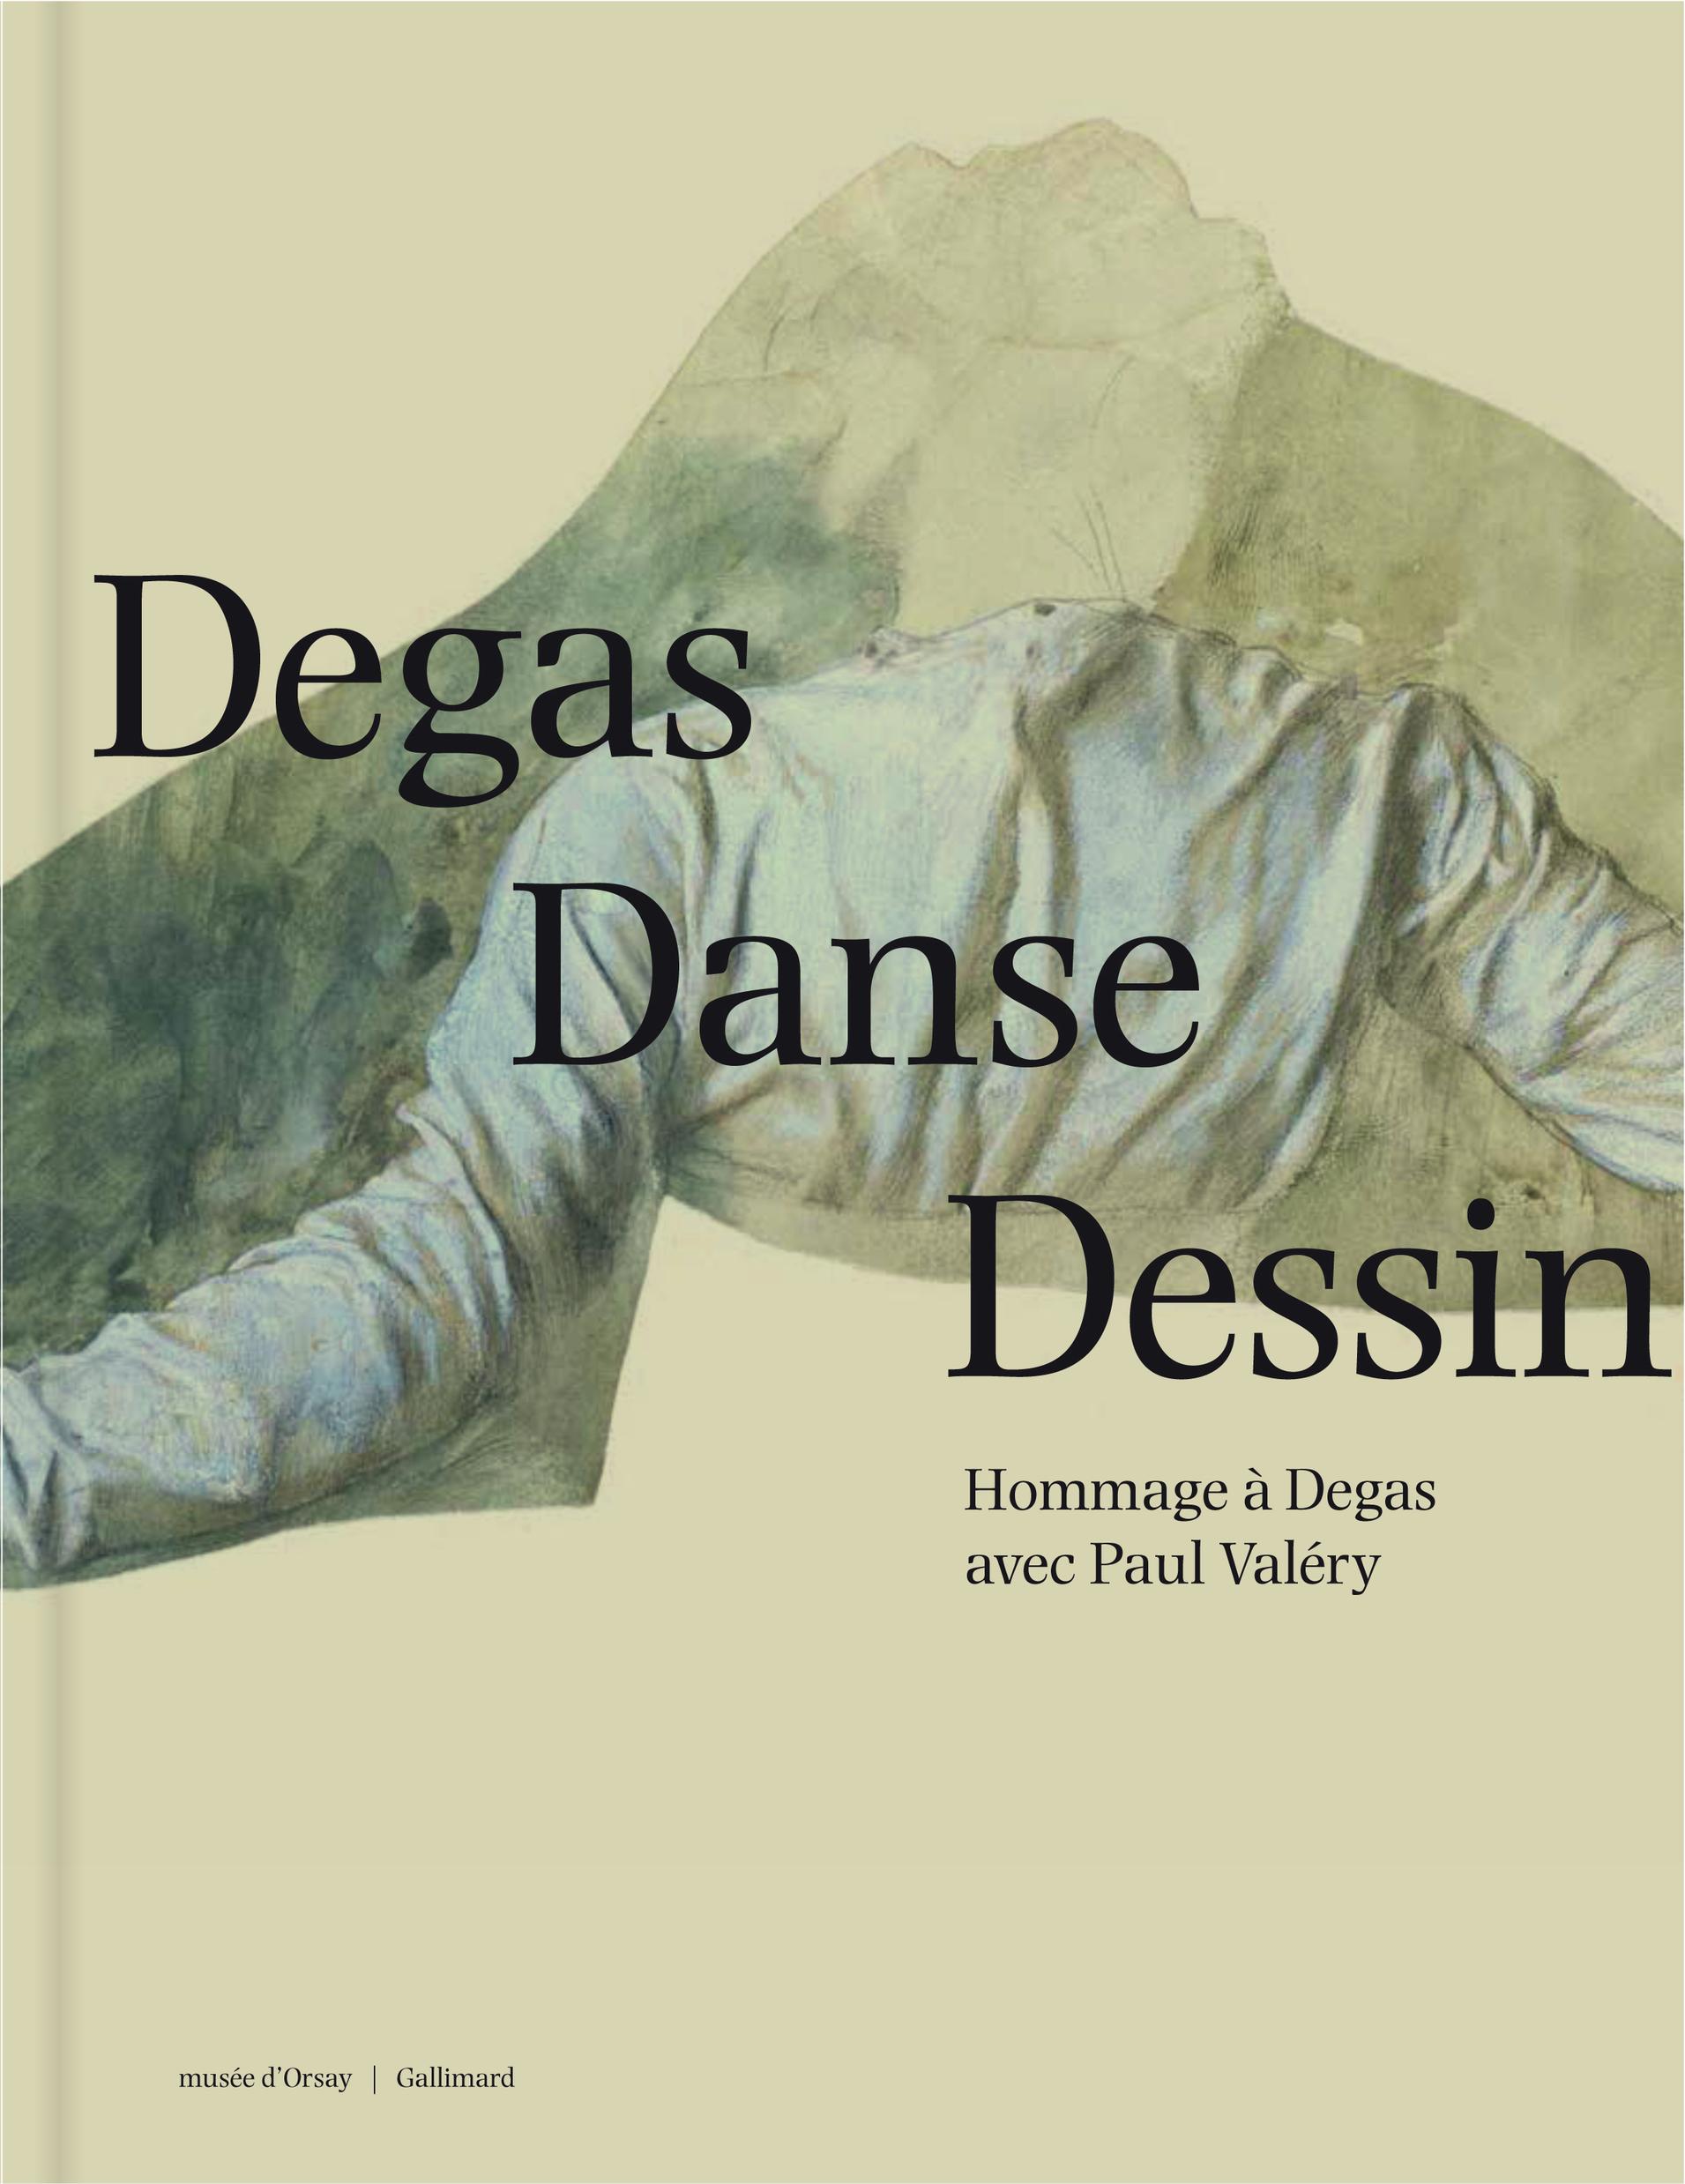 DEGAS DANSE DESSIN - HOMMAGE A DEGAS AVEC PAUL VALERY